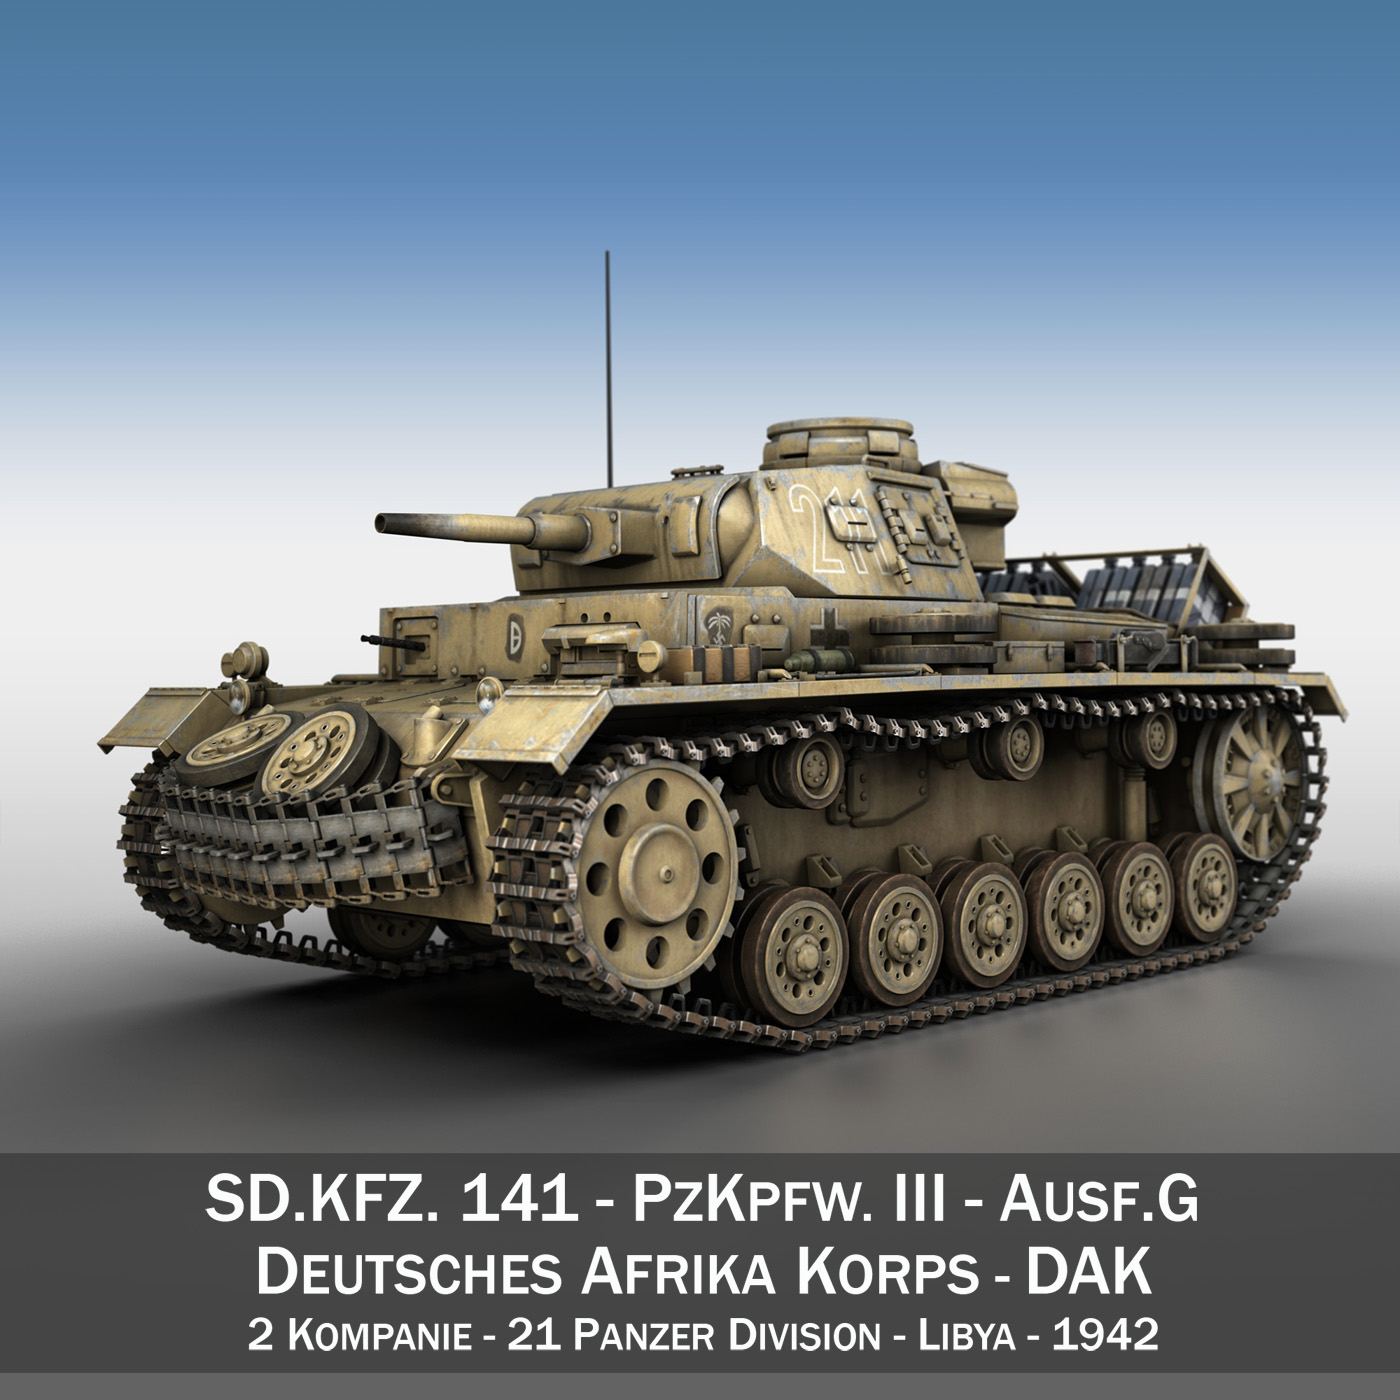 PzKpfw III - Panzer 3 - Ausf.G - DAK - 211 3d model  266462